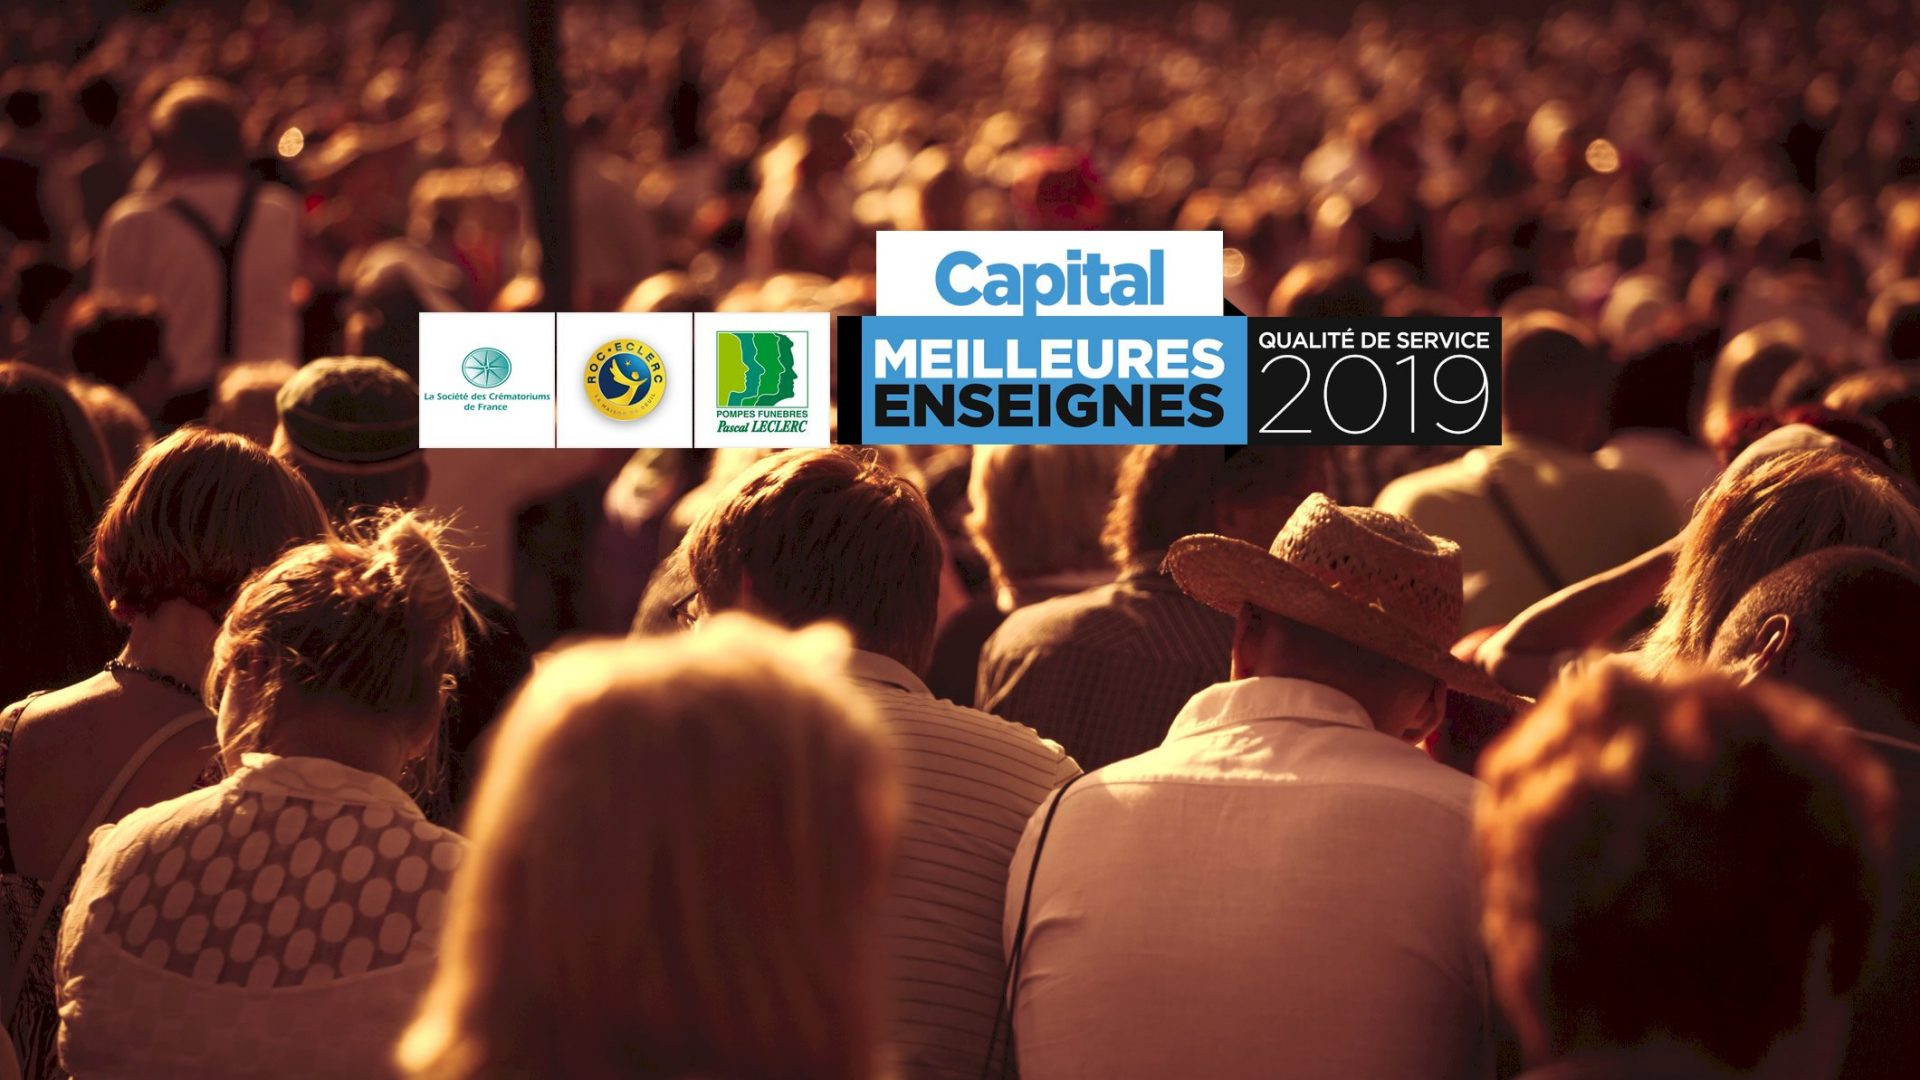 meilleures enseignes capital 2019